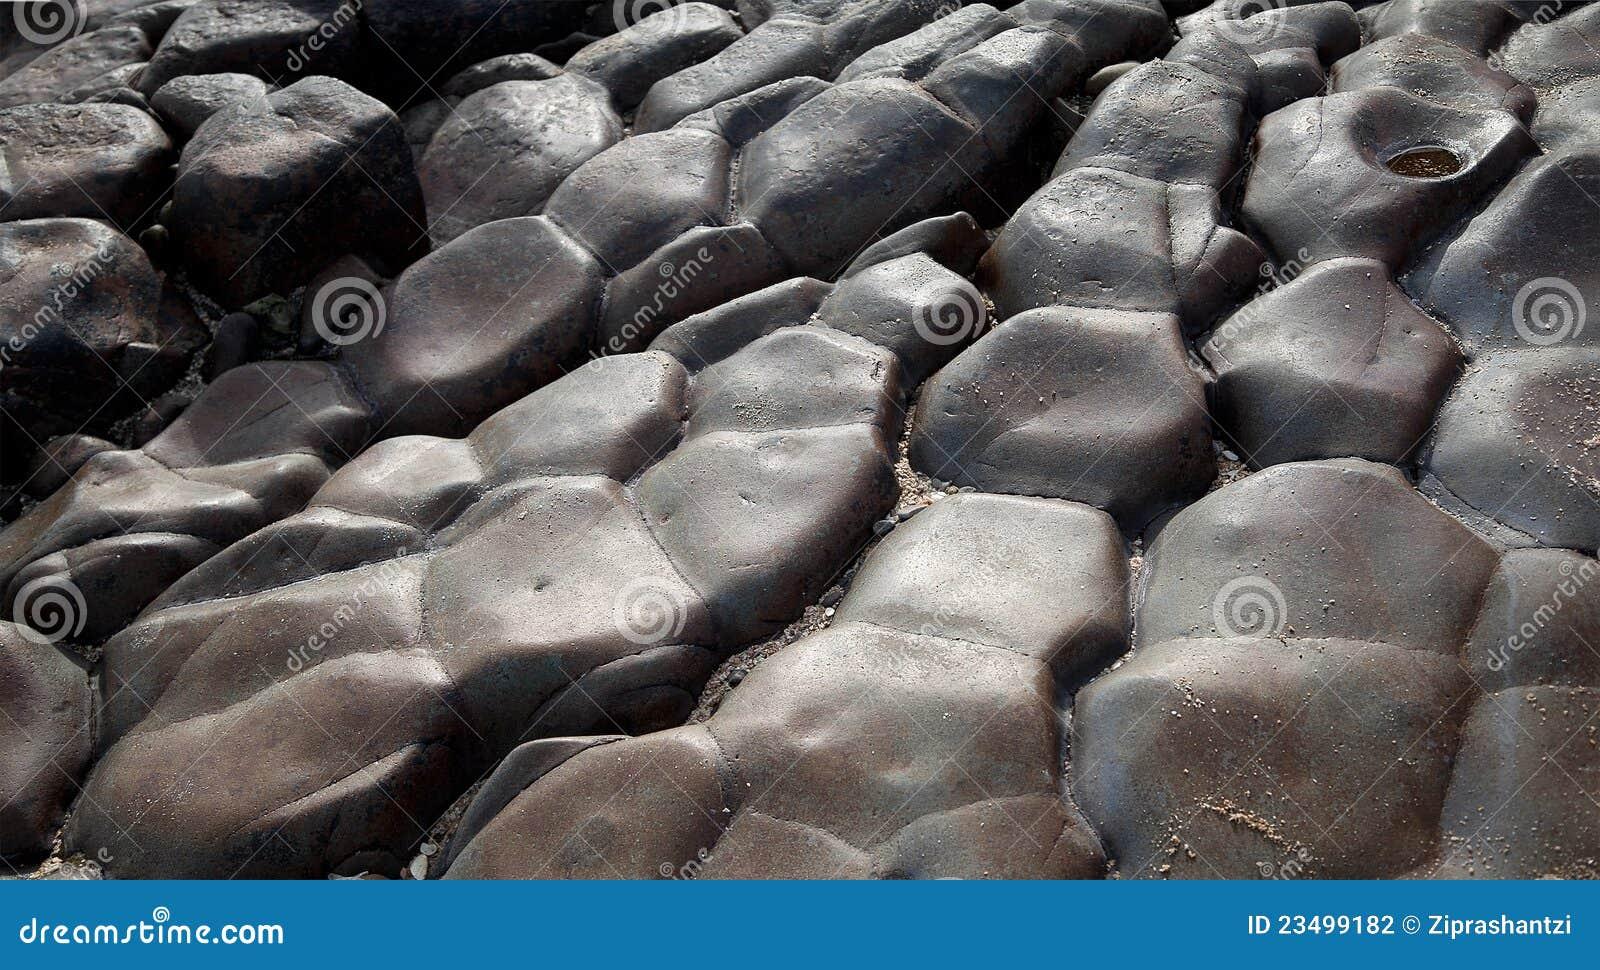 Black Smooth Stone Rocks Texture Stock Photo Image Of